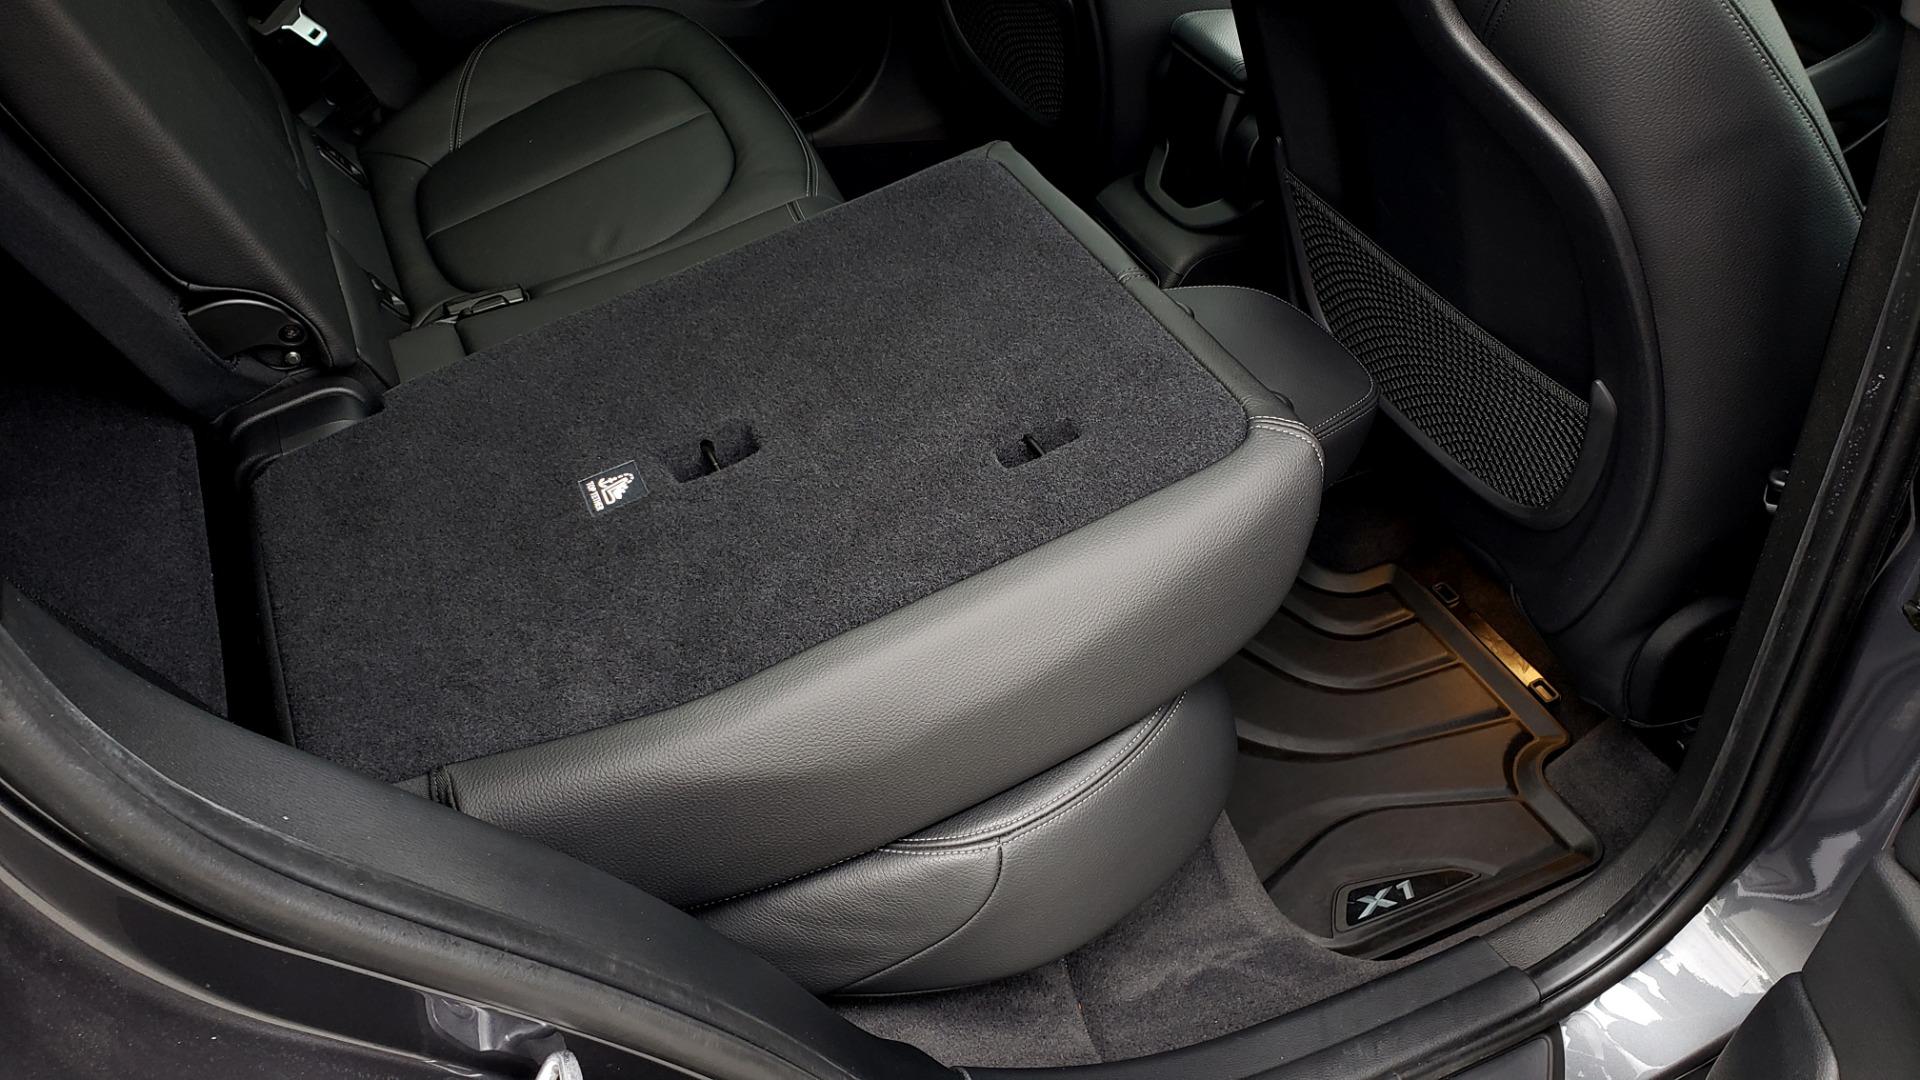 Used 2017 BMW X1 XDRIVE28I / PREM PKG / DRIVER ASST / NAV / CLD WTHR for sale Sold at Formula Imports in Charlotte NC 28227 78